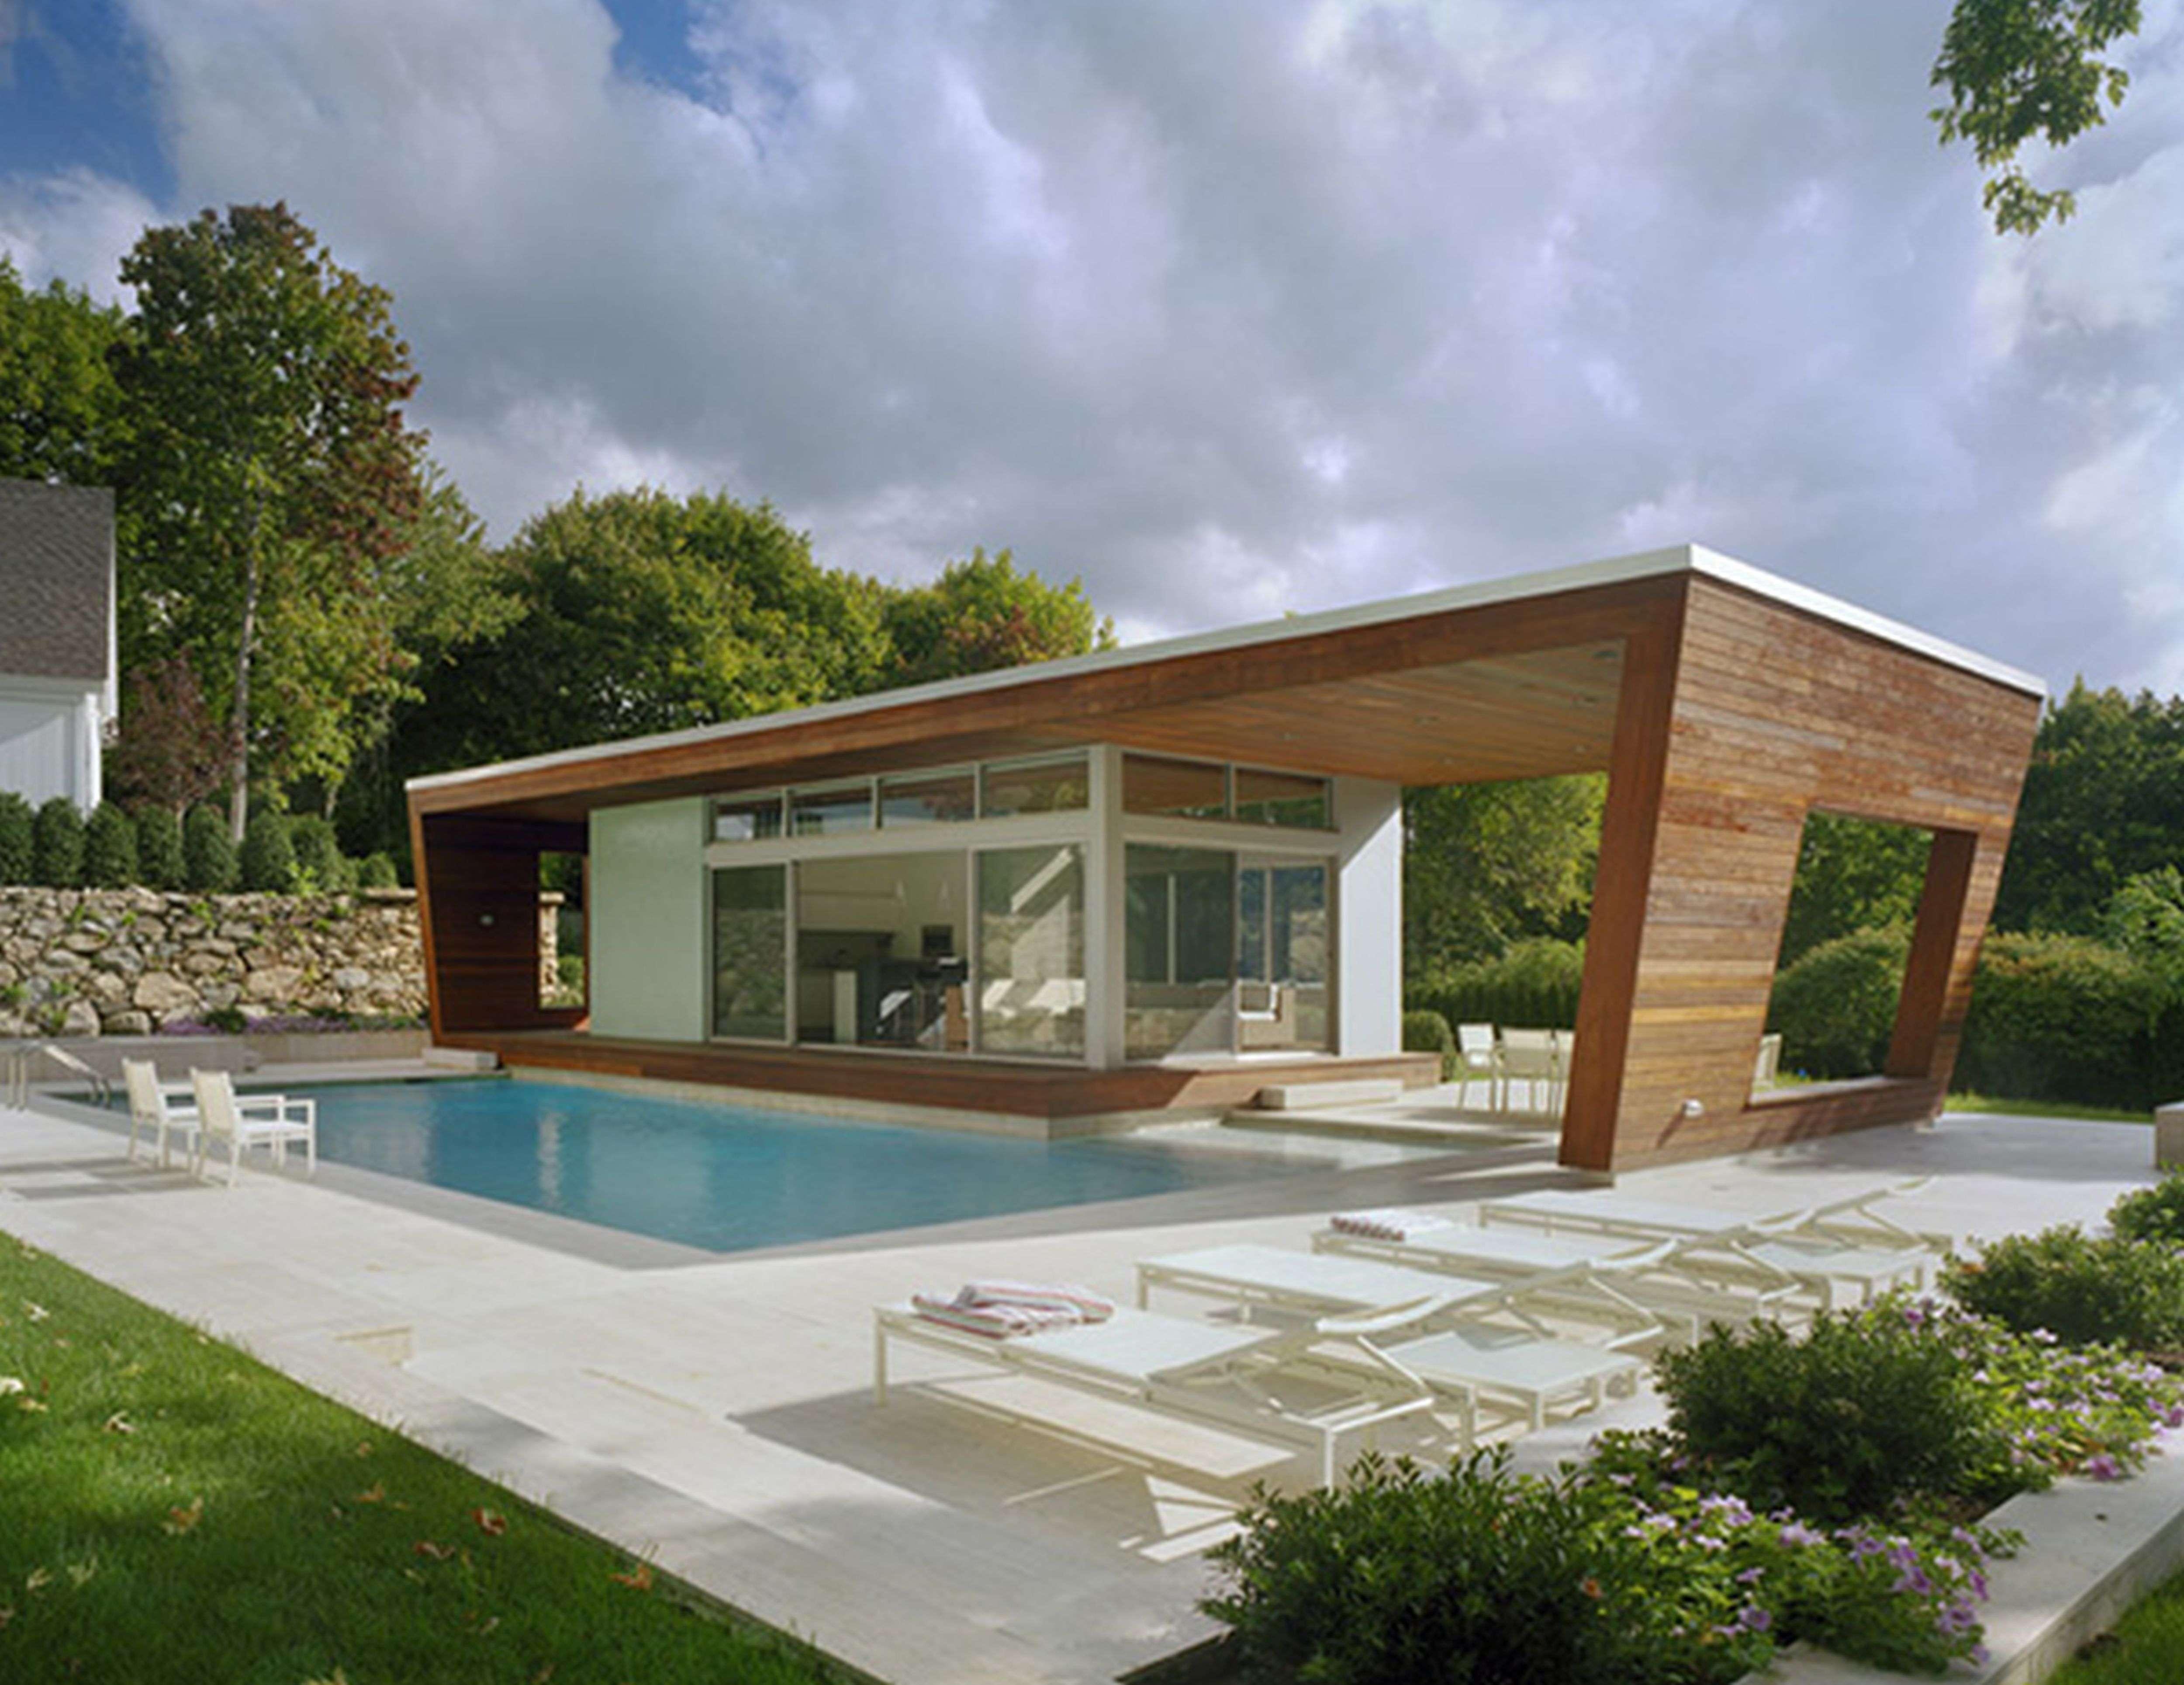 Modern Bungalow House Plans Australia